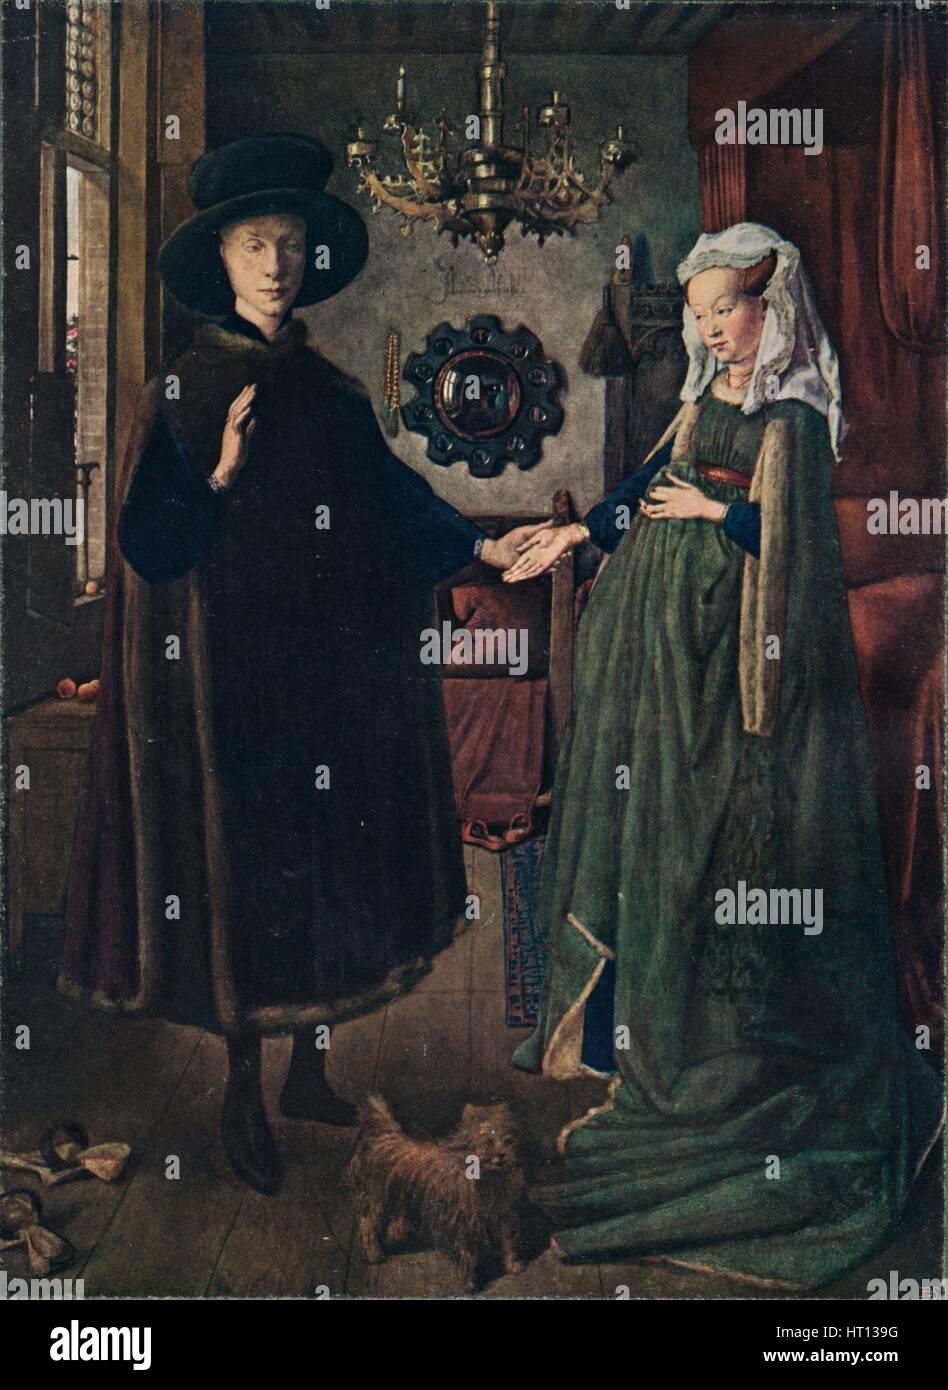 the arnolfini portrait 1434 1904 artist jan van eyck